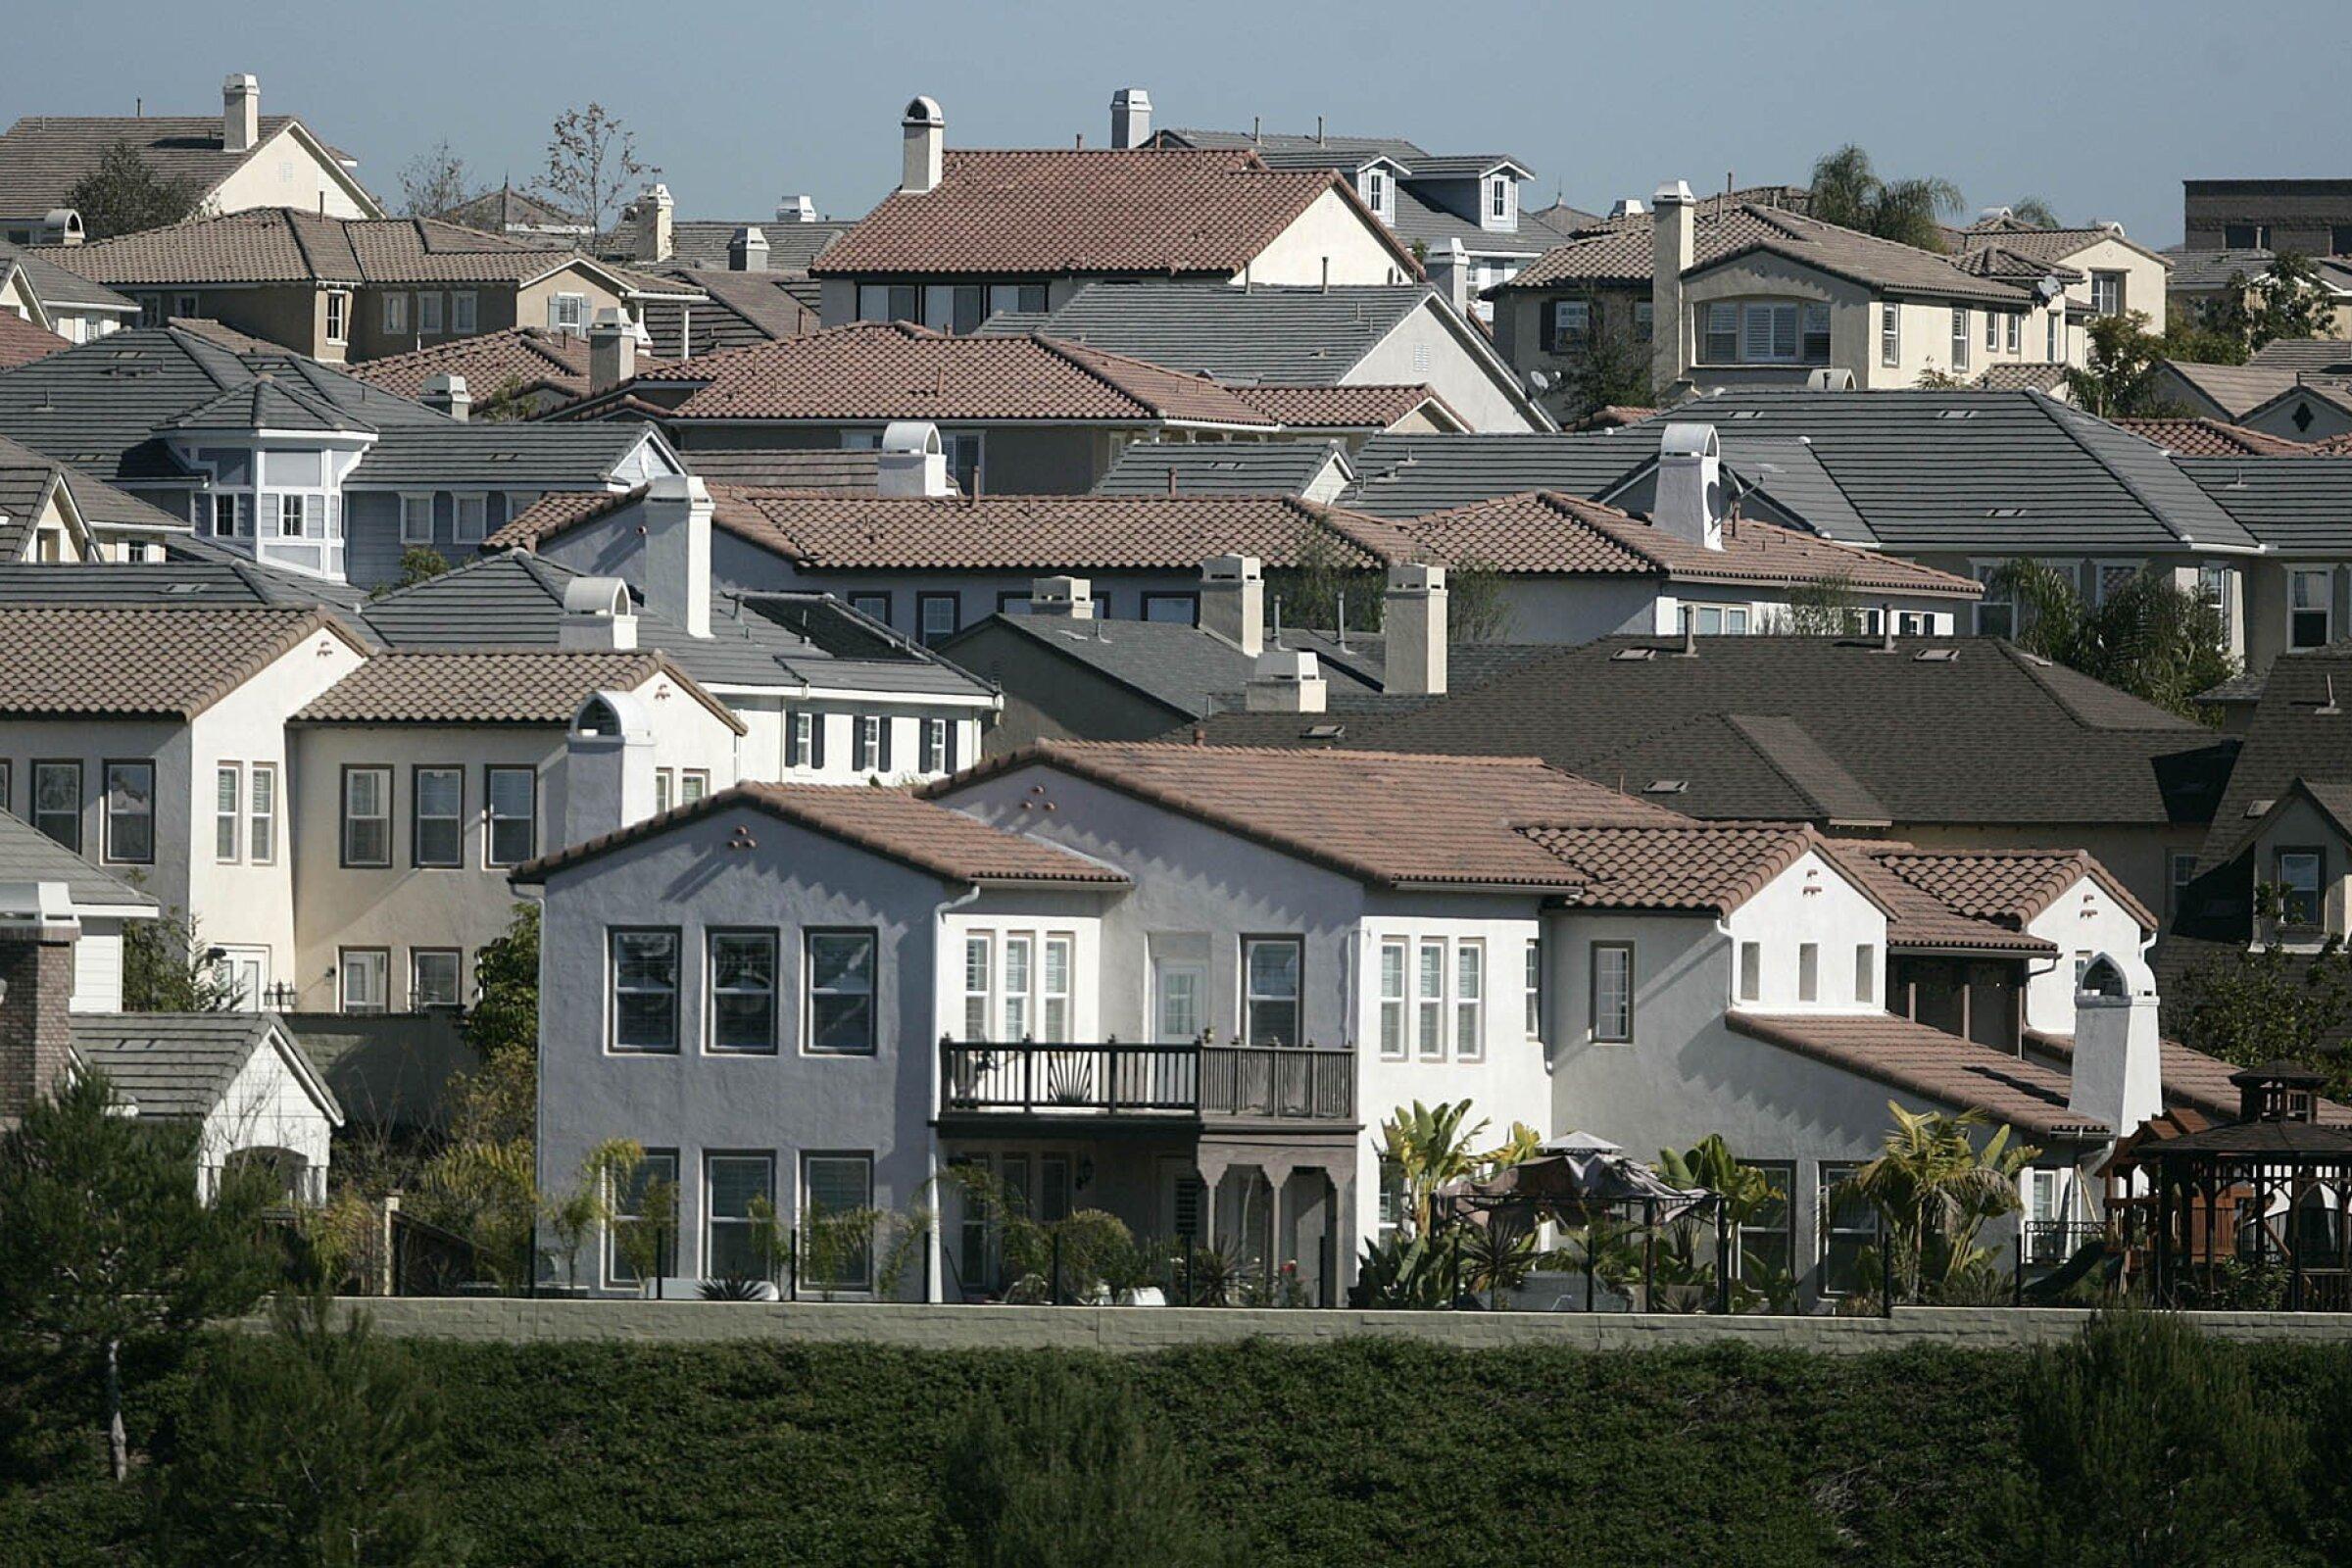 Homes in Carlsbad.